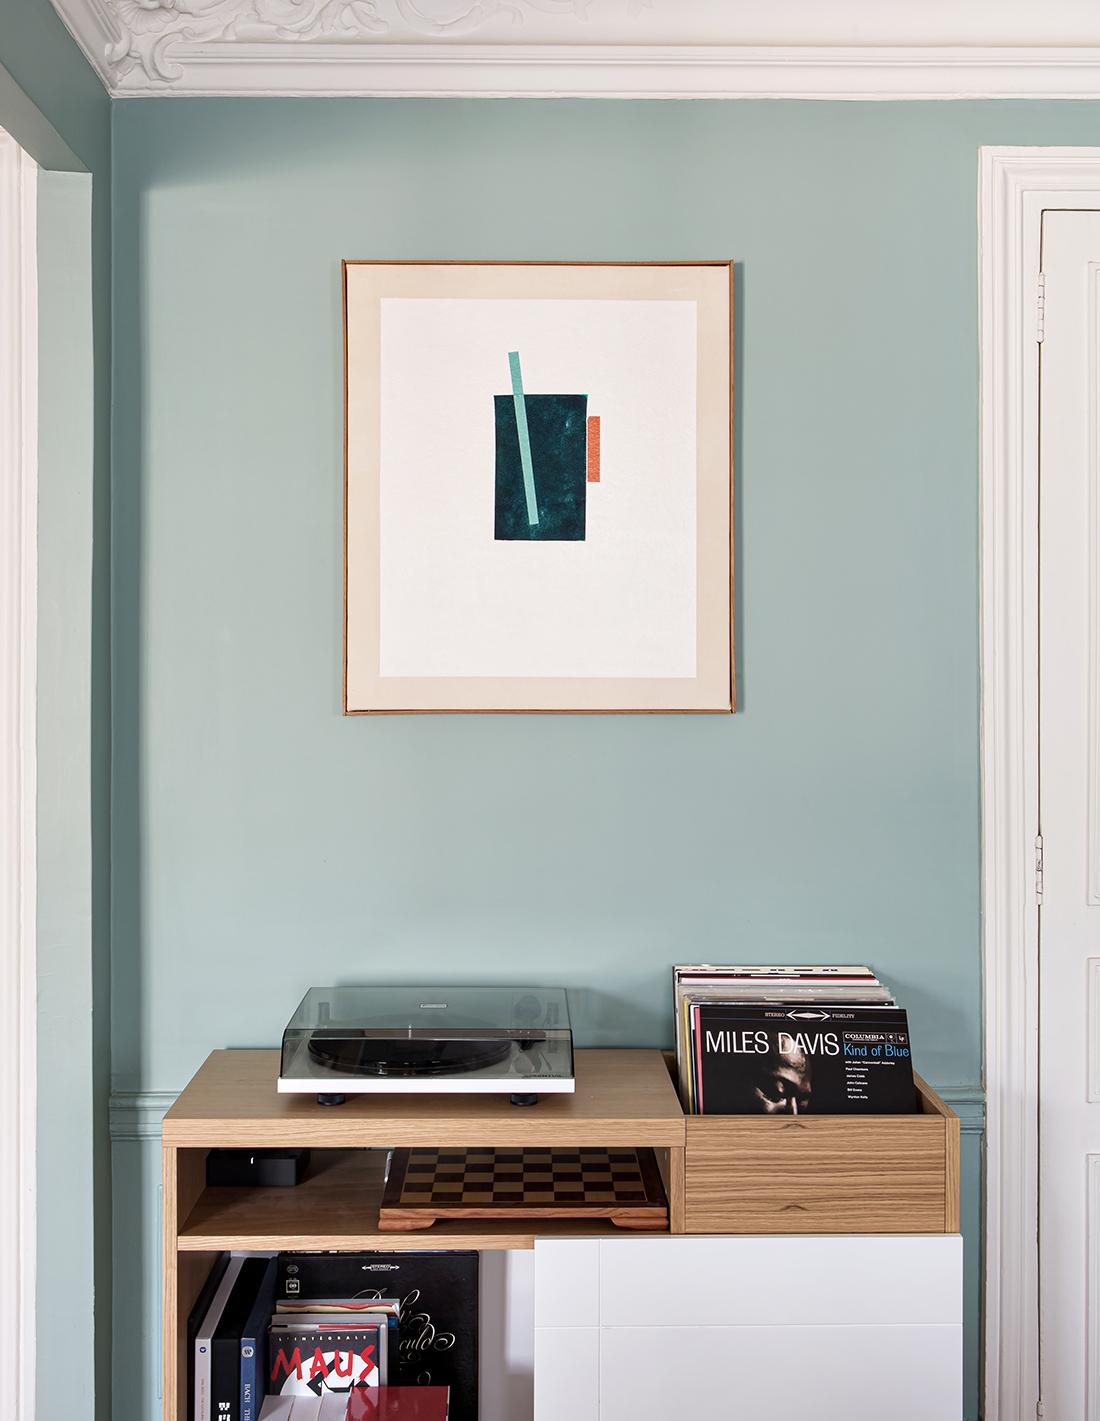 Carlos Stoffel, Acrylique et collage de tissu sur toile